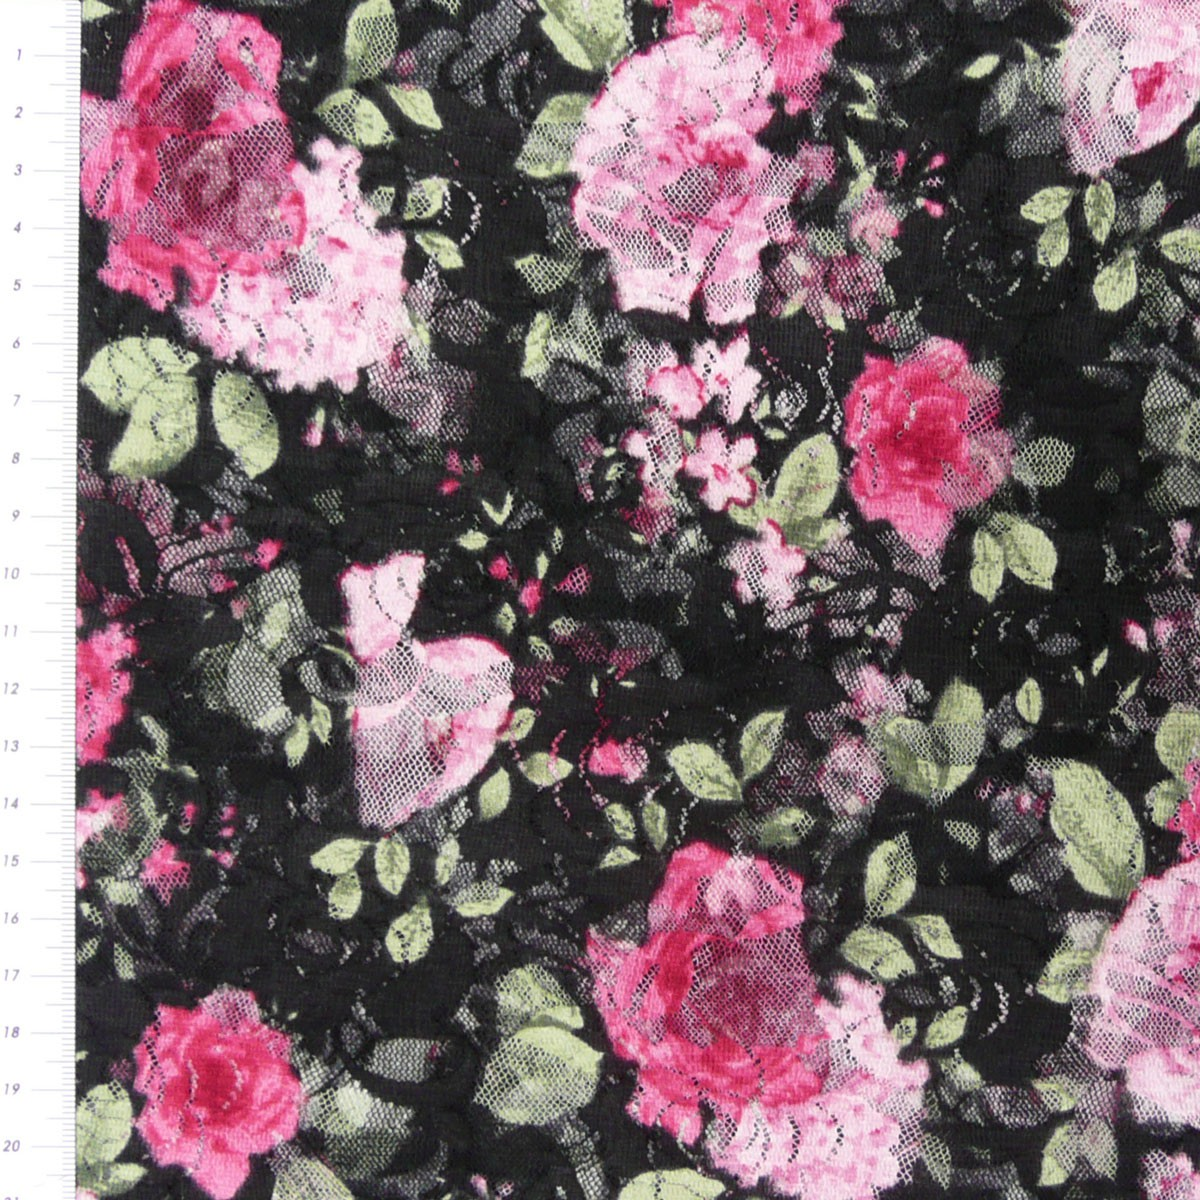 9 96 1qm bekleidungsstoff stoff t ll spitze mesh rose rosen schwarz. Black Bedroom Furniture Sets. Home Design Ideas